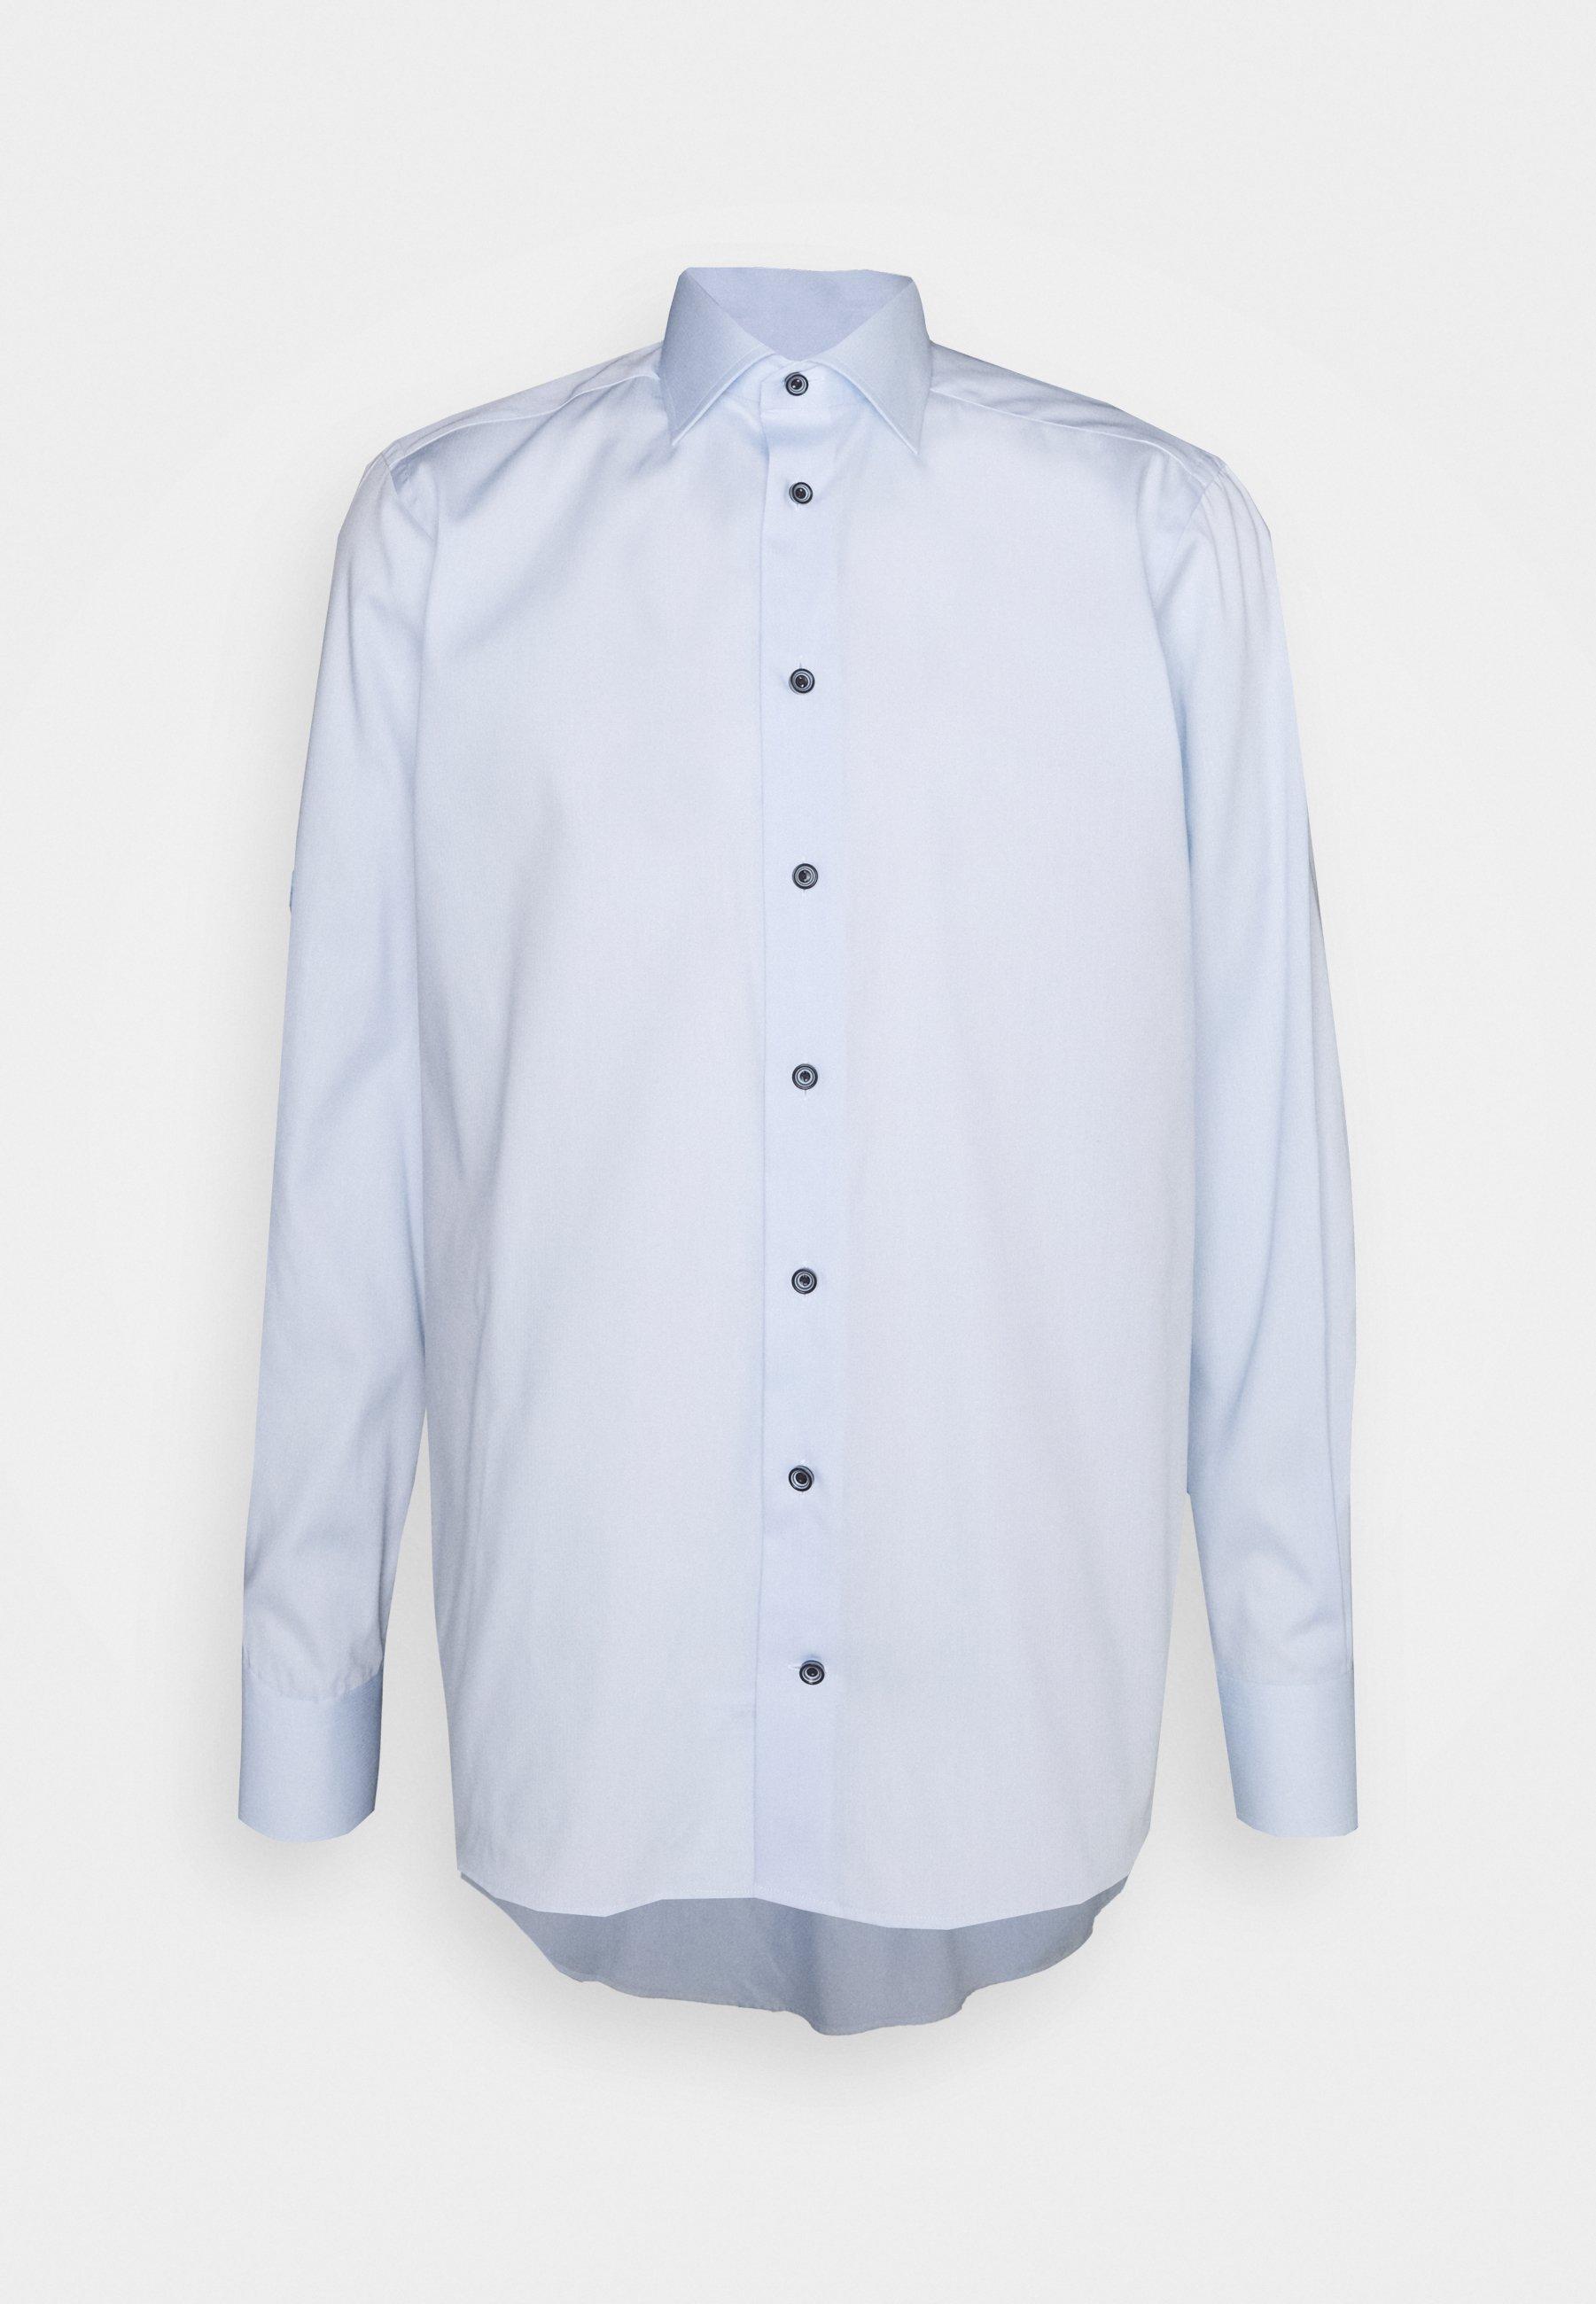 Men CONTEMPORARY FINE STRIPES WEAVE SHIRT - Formal shirt